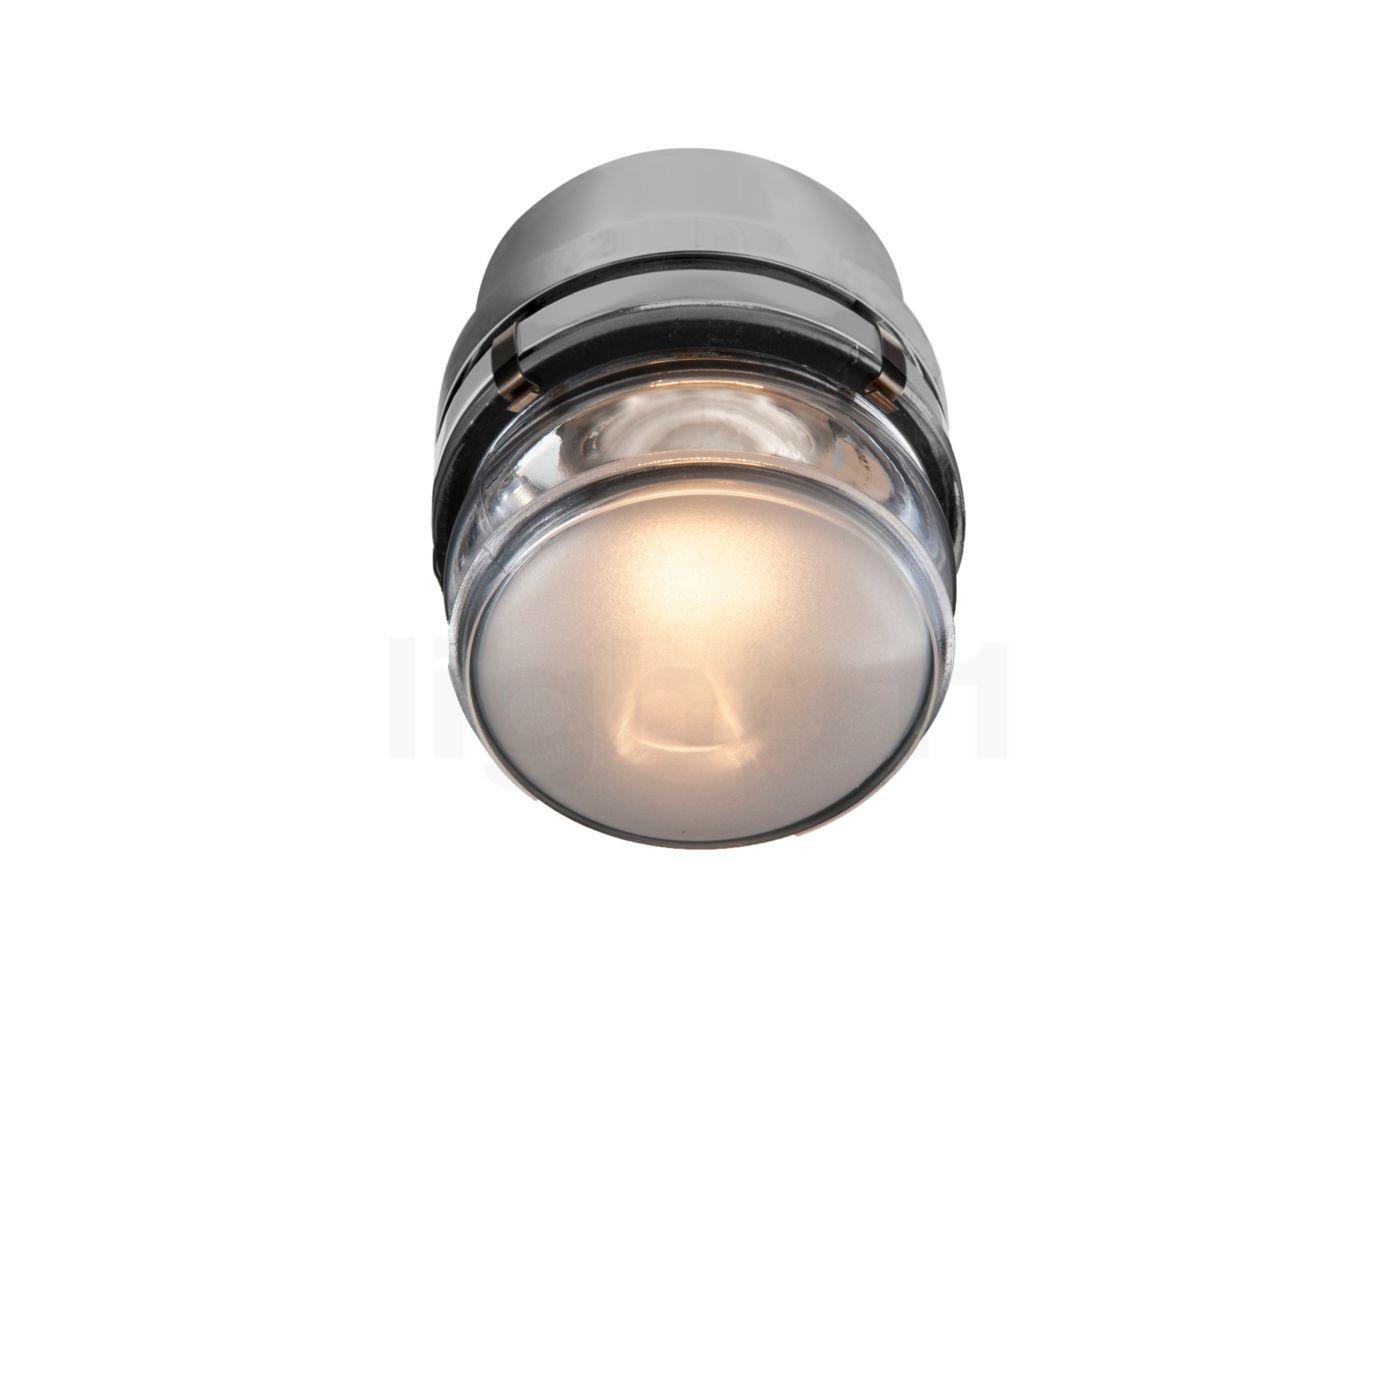 Oluce Fresnel Wandleuchte Outdoor LED, grau L1148/LBT GR